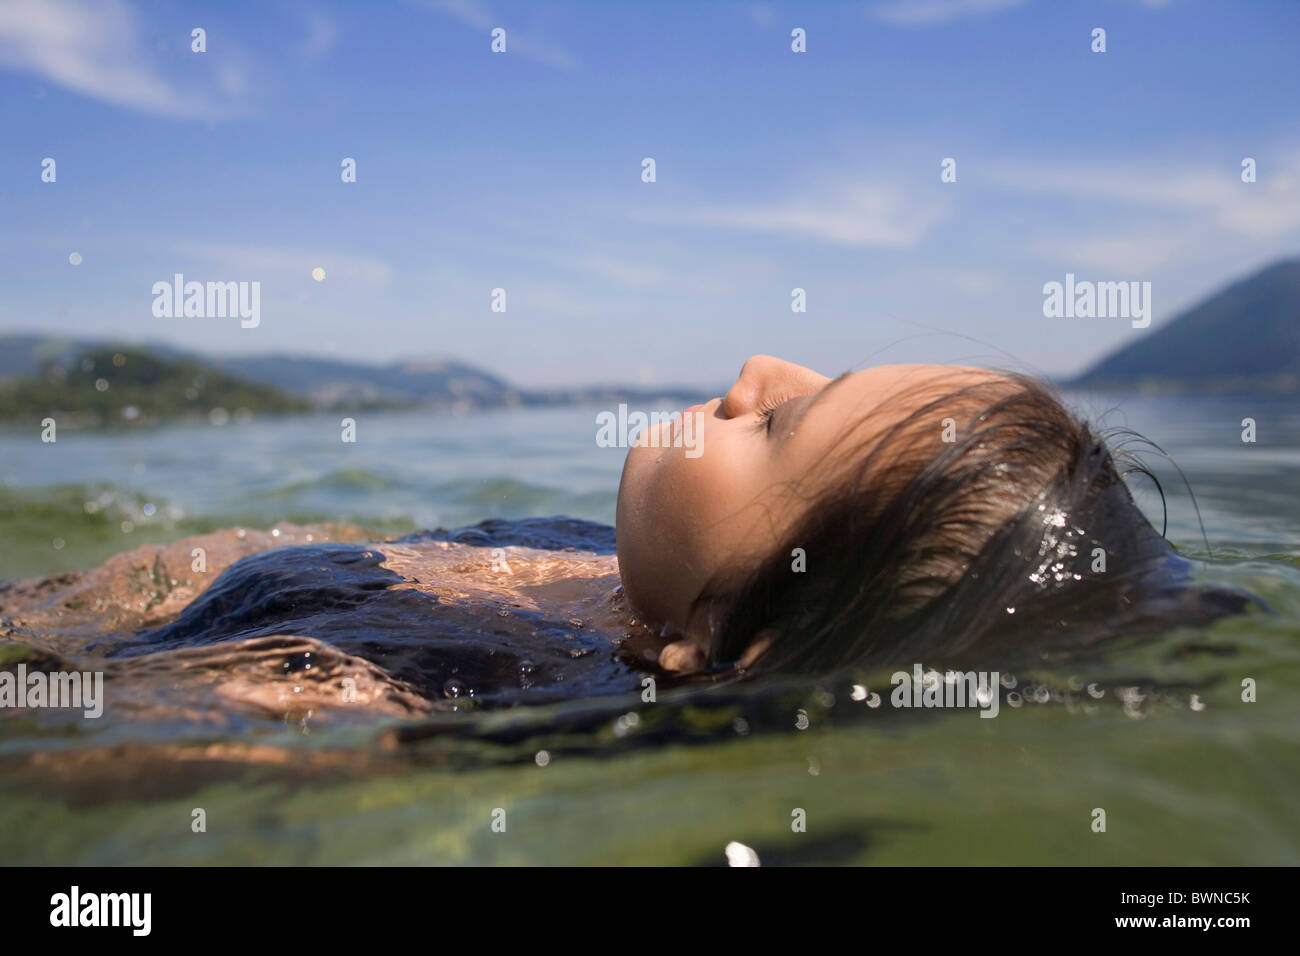 Girl water bikini bath bathing young woman summer recreation lake ...